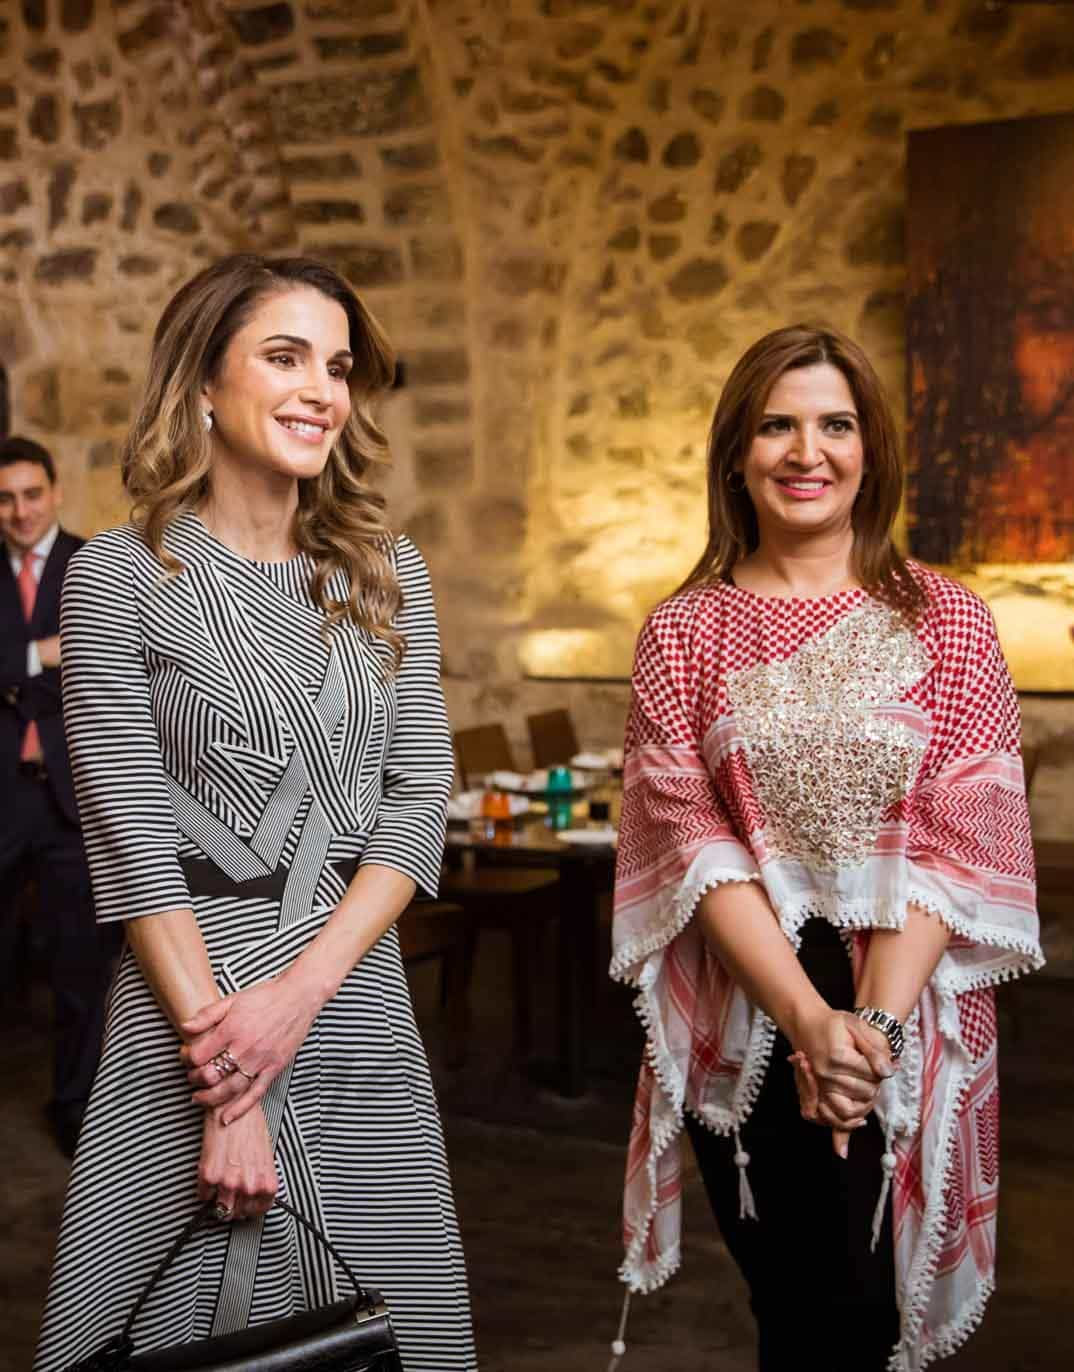 rania de jordania con el grupo sayyidat nashmiyyat